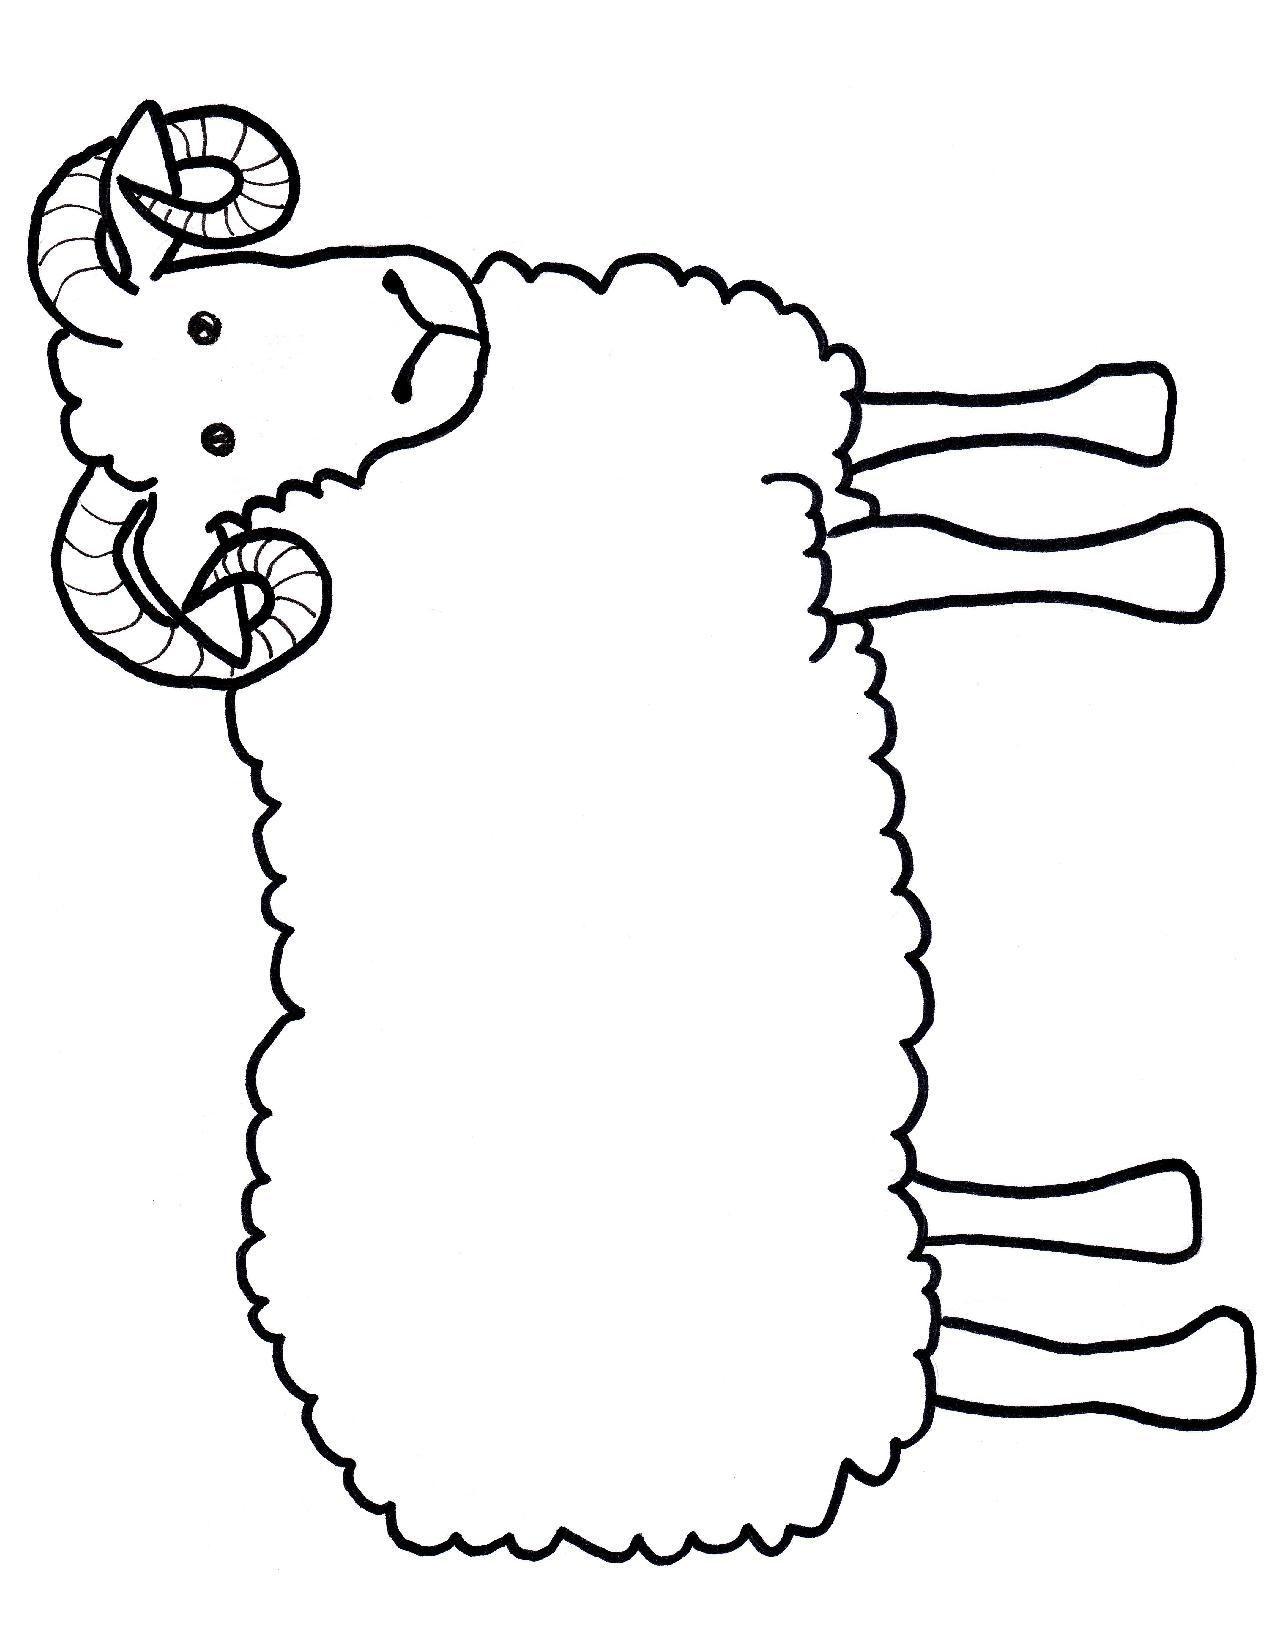 1275x1650 Chinese Ram Kids Drawing Page Ram Craft Template Kids Craft Free